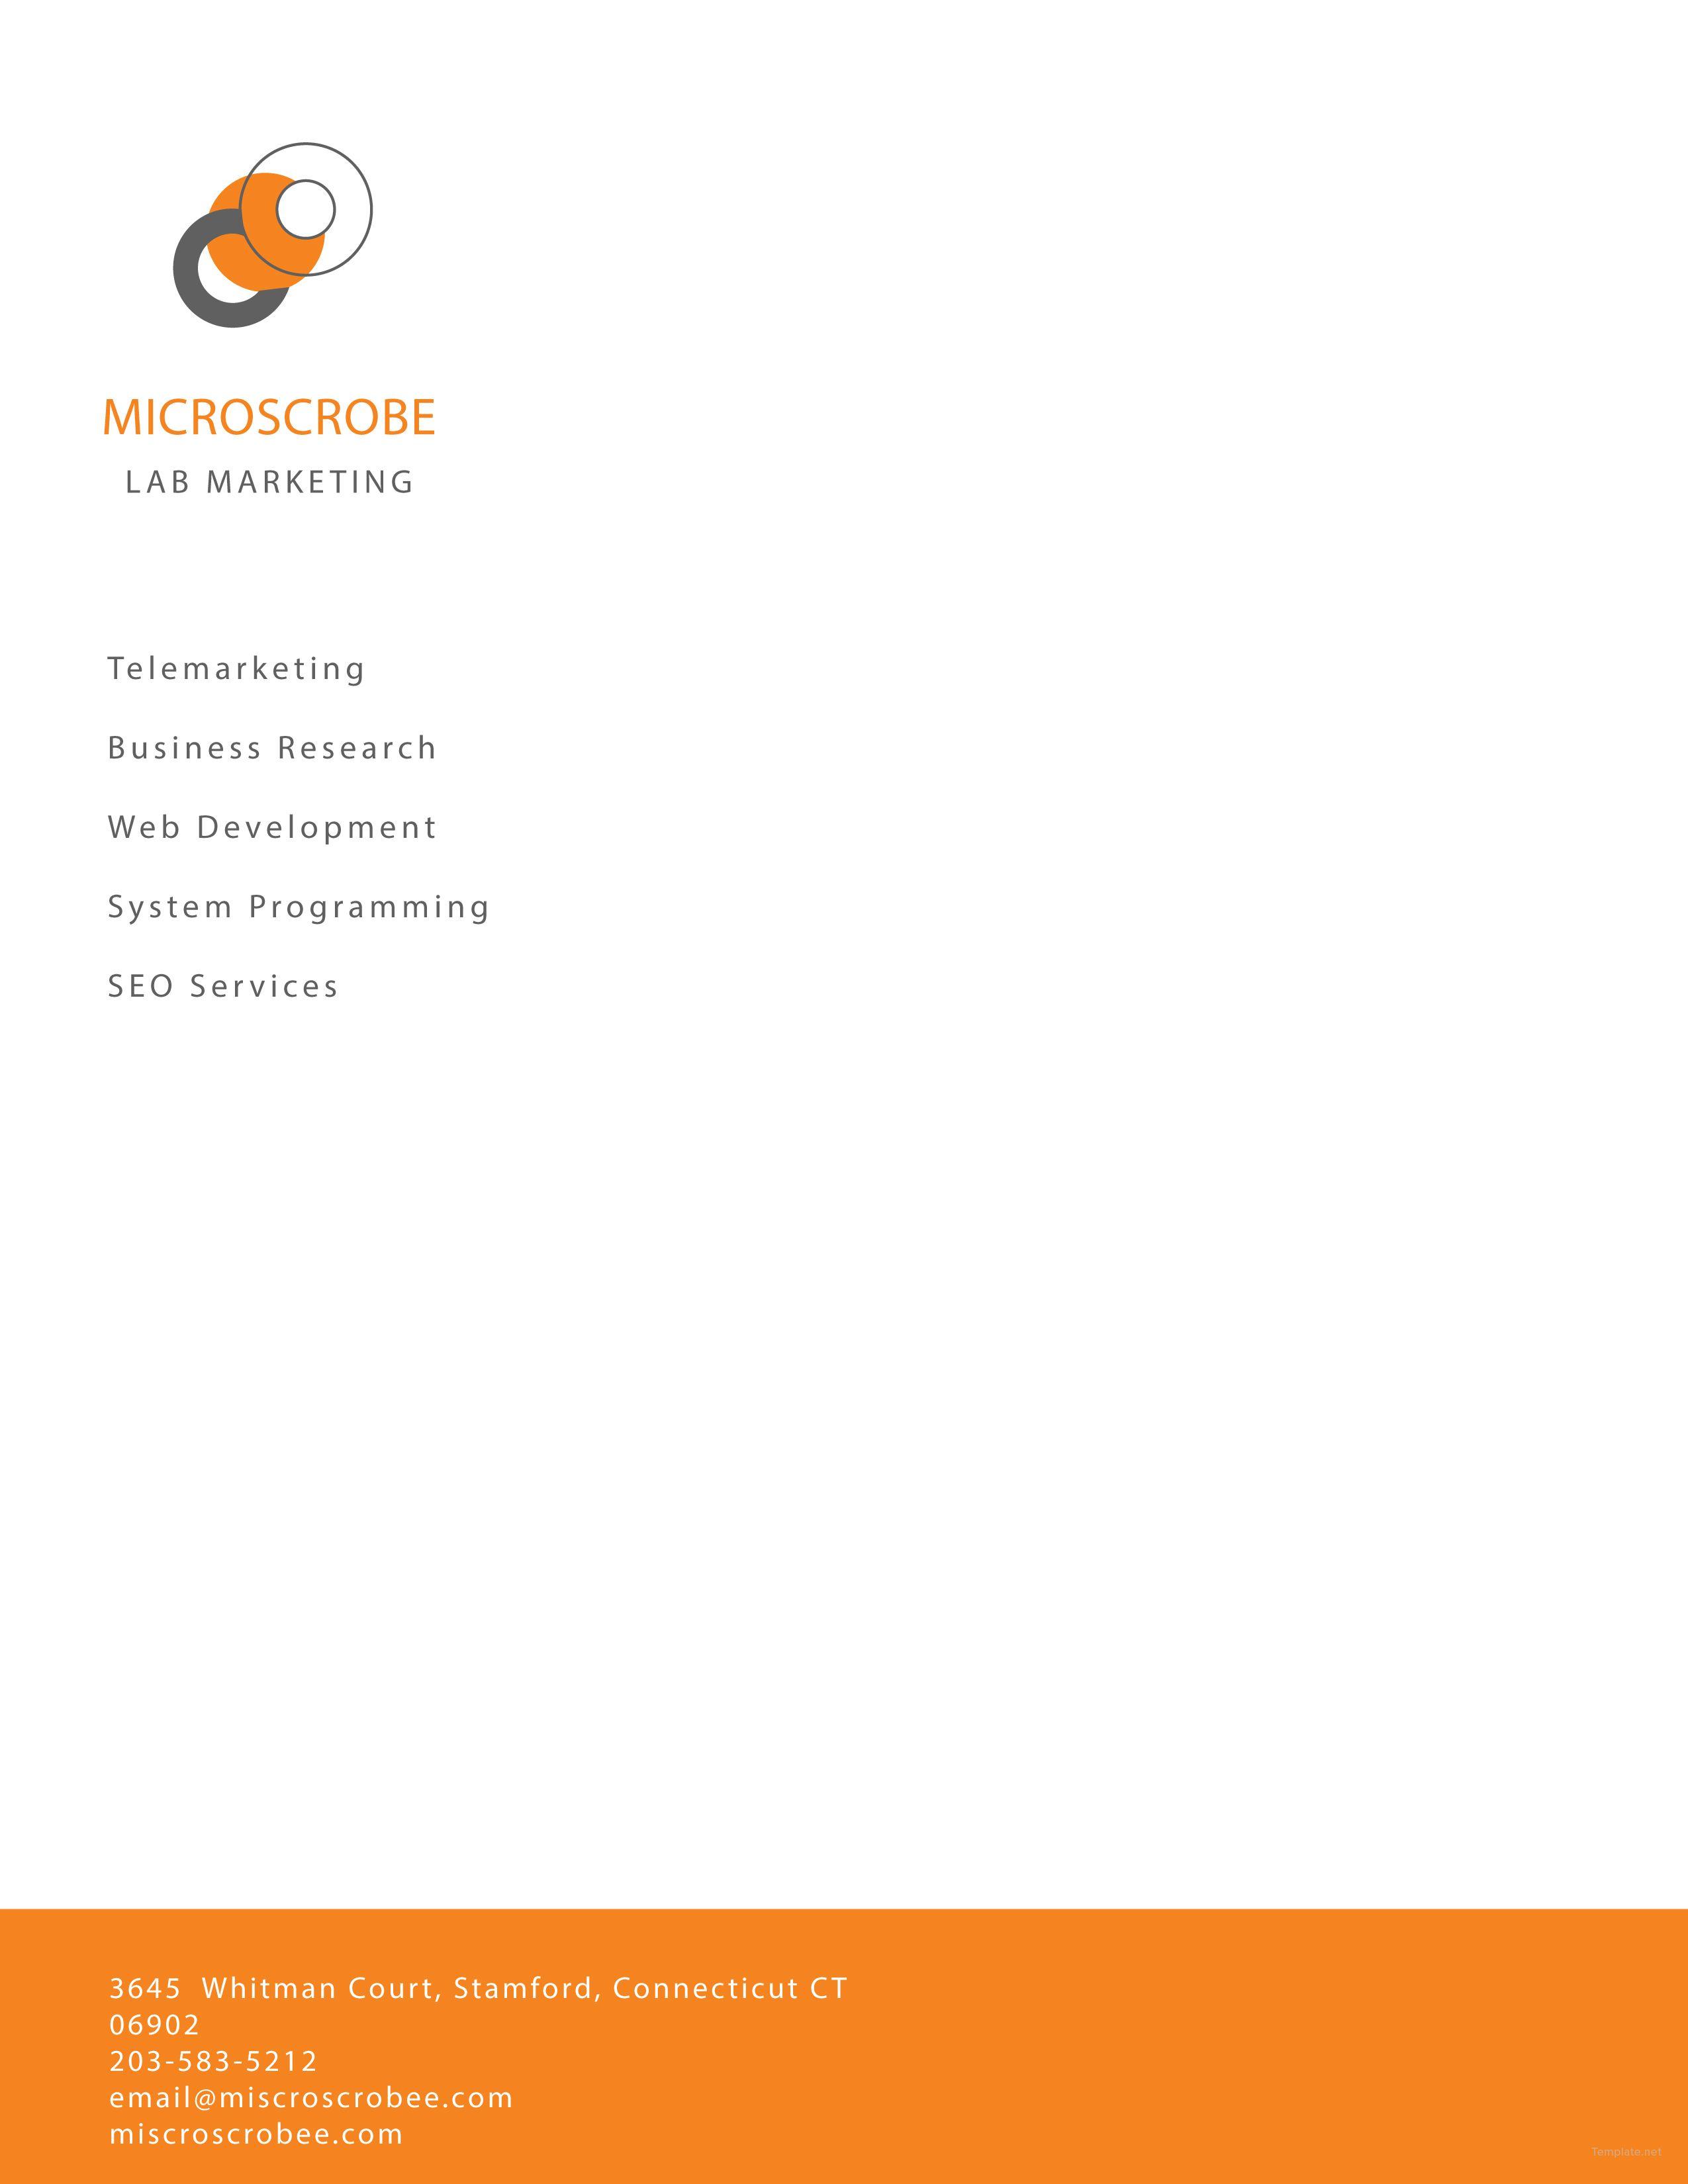 free business marketing letterhead template functional resume for nurses team leader samples good cv